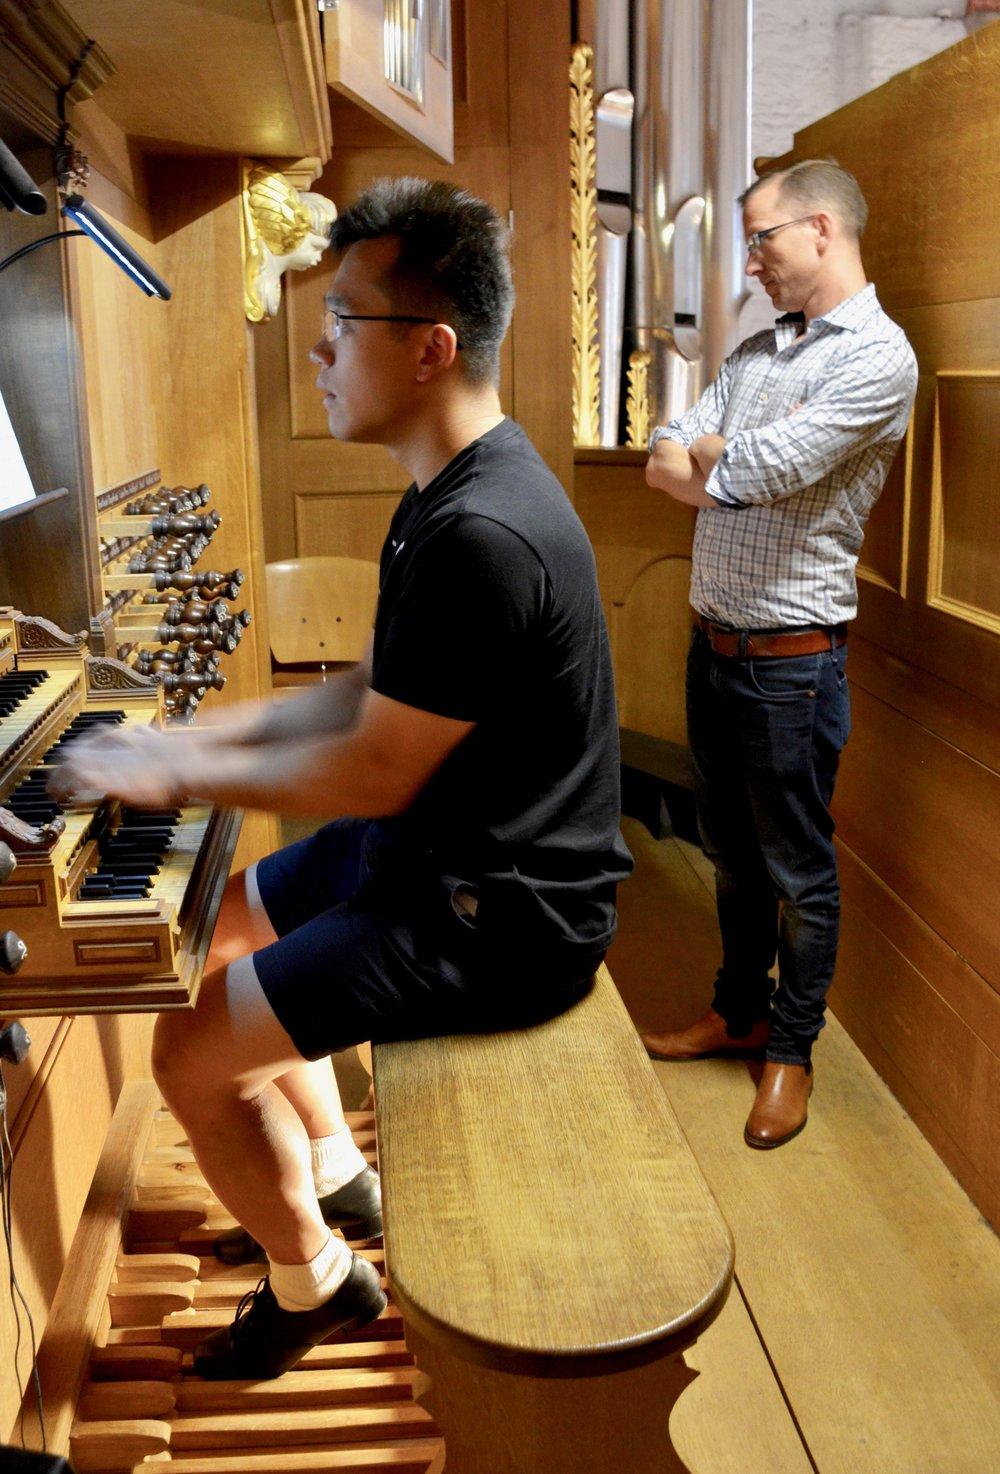 Adrian Cho plays 1693 Schnitger organ, St. Jacobi, Hamburg.